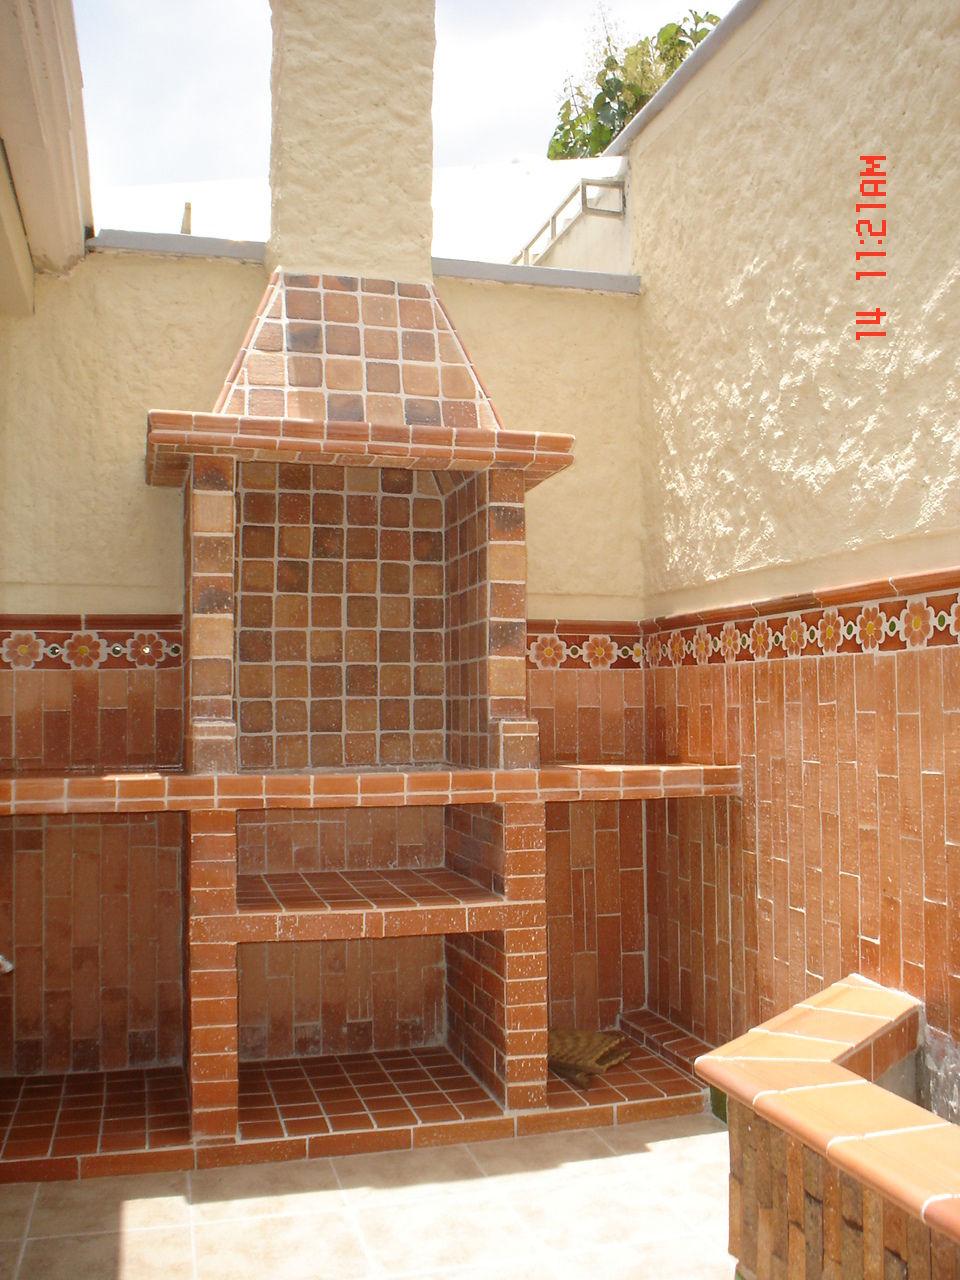 Deposito de materiales en bucaramanga pisos para for Asadores de jardin rusticos